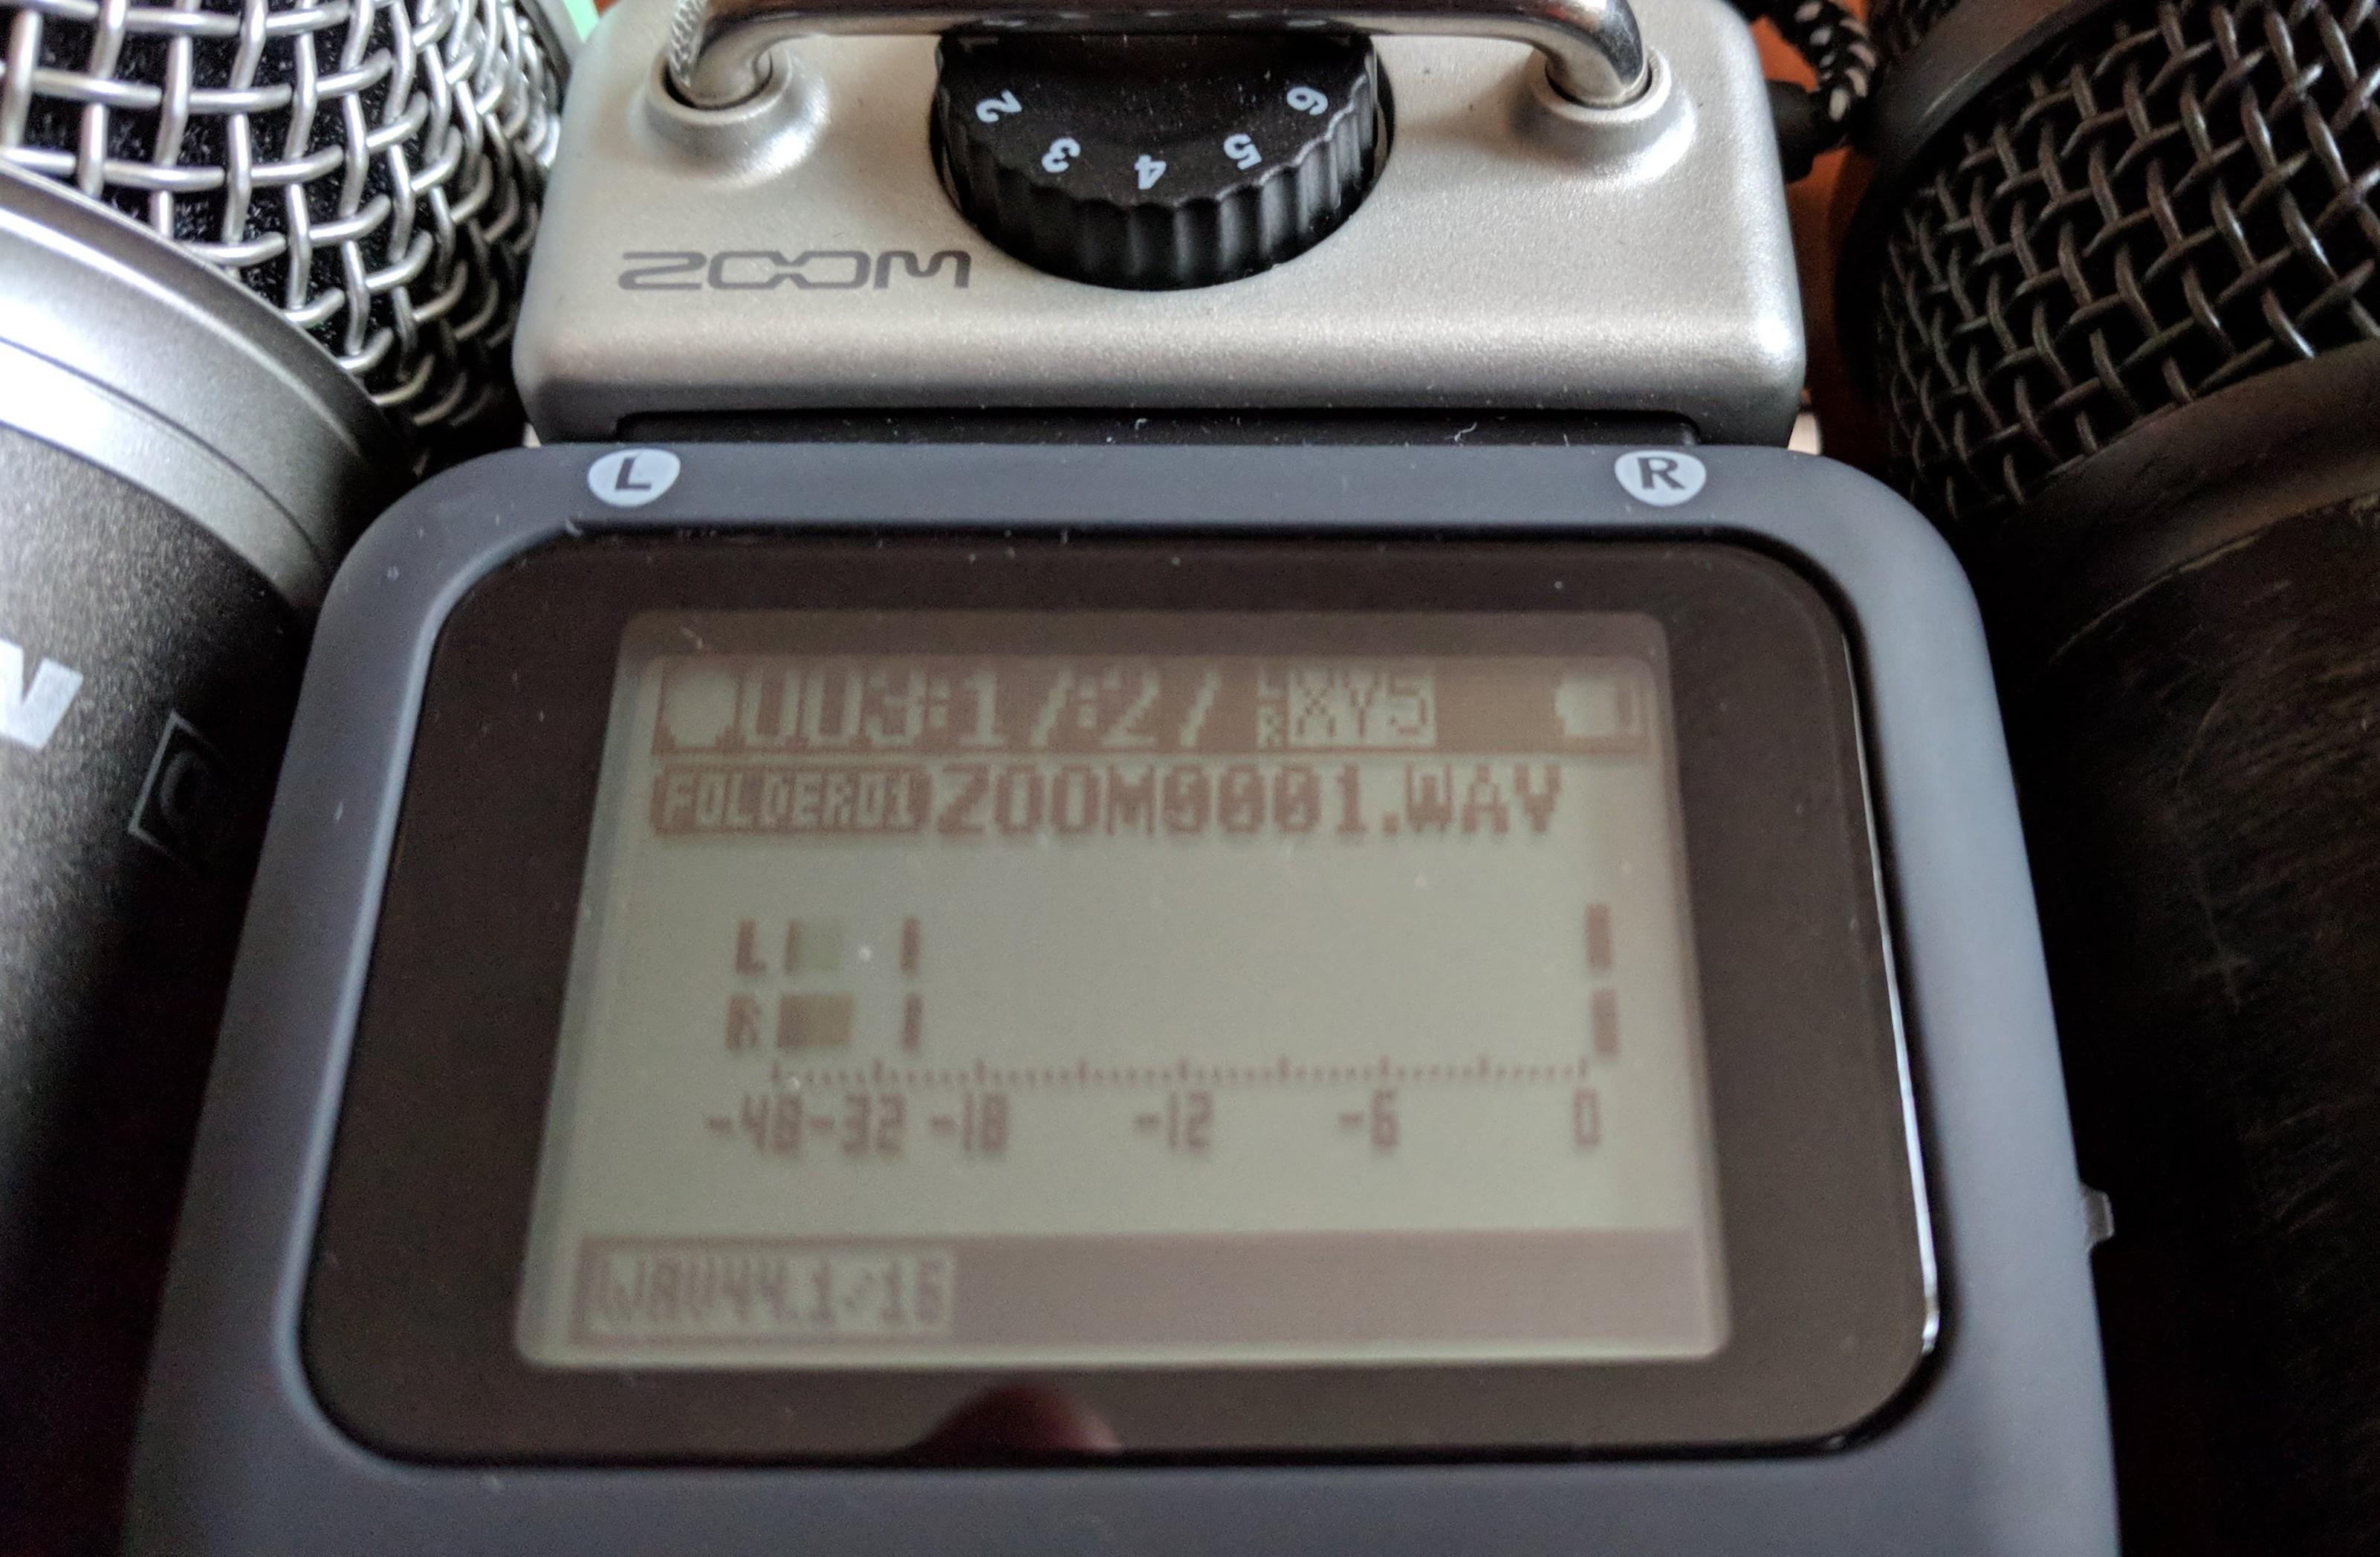 File:Zoom H5 -4 jpg - Wikimedia Commons